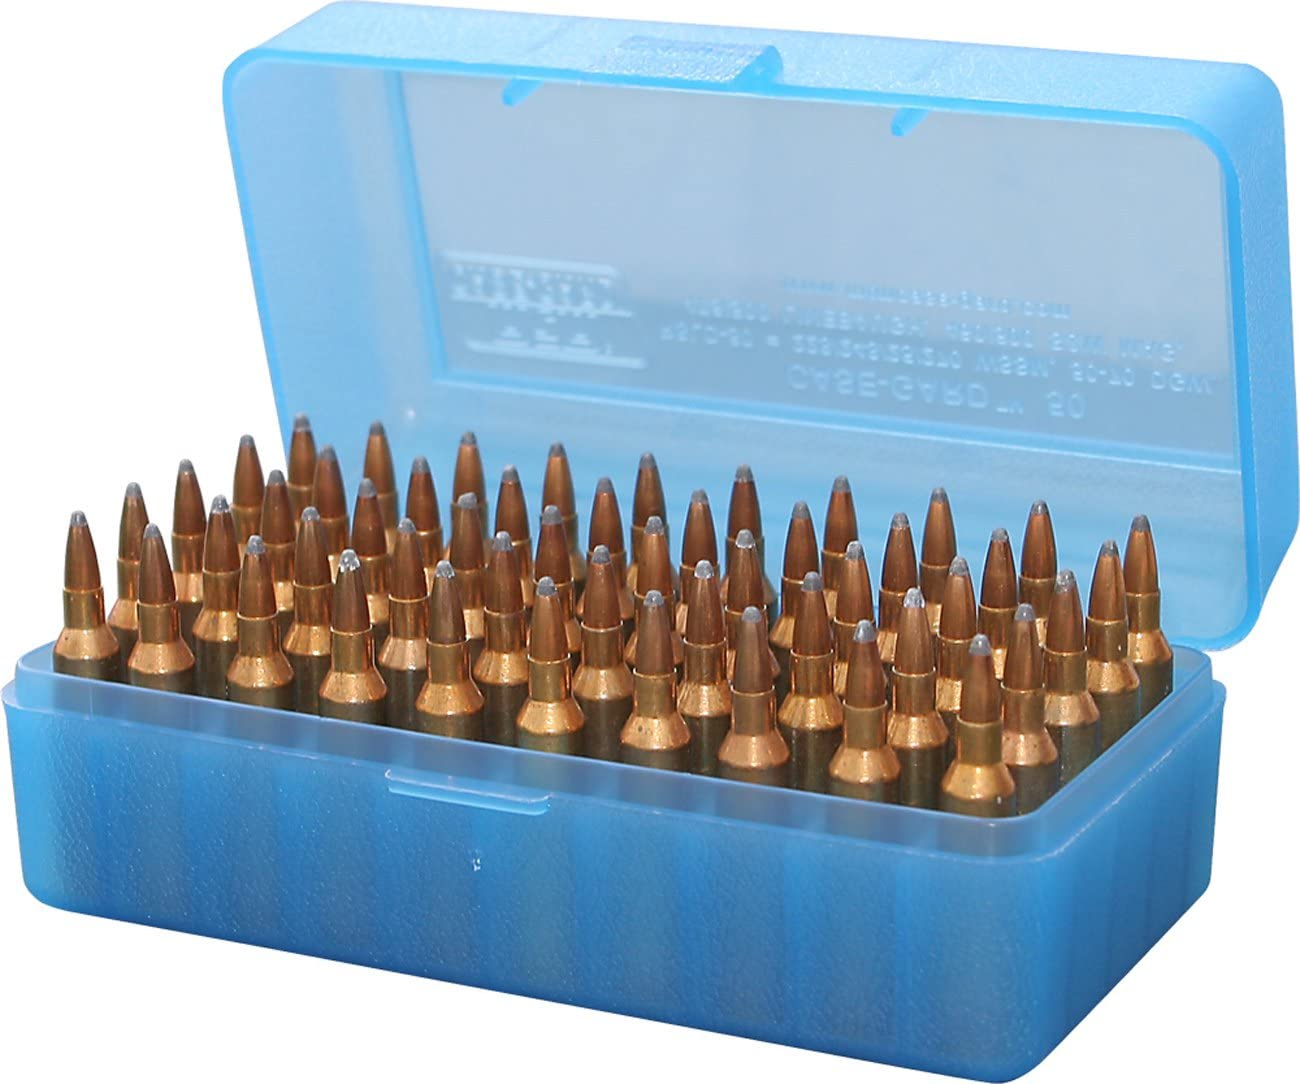 FLIP TOP PLASTIC 50 RIFLE ROUND CARTRIDGE AMMUNITION BOX CASE for ammo bullet